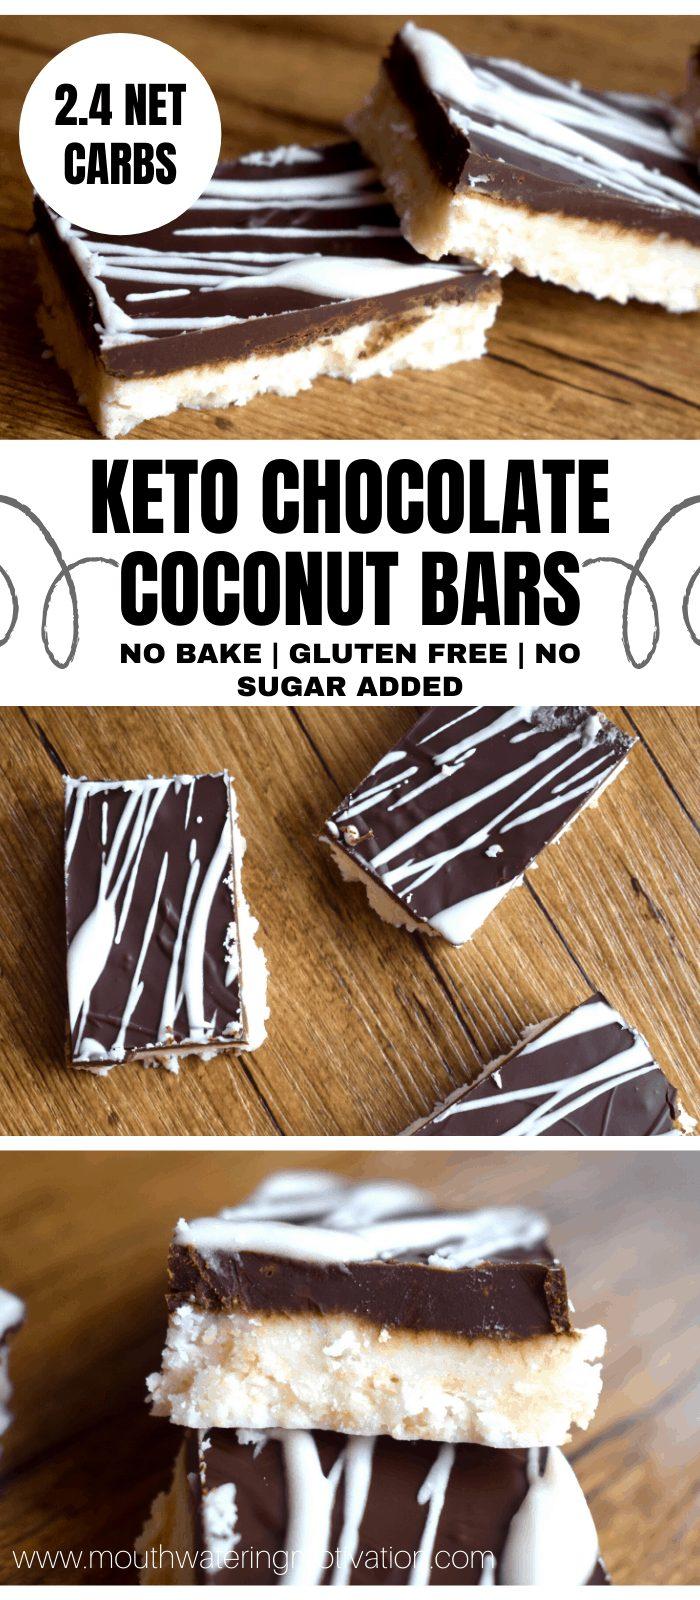 KETO CHOCOLATE COOCNUT BARS